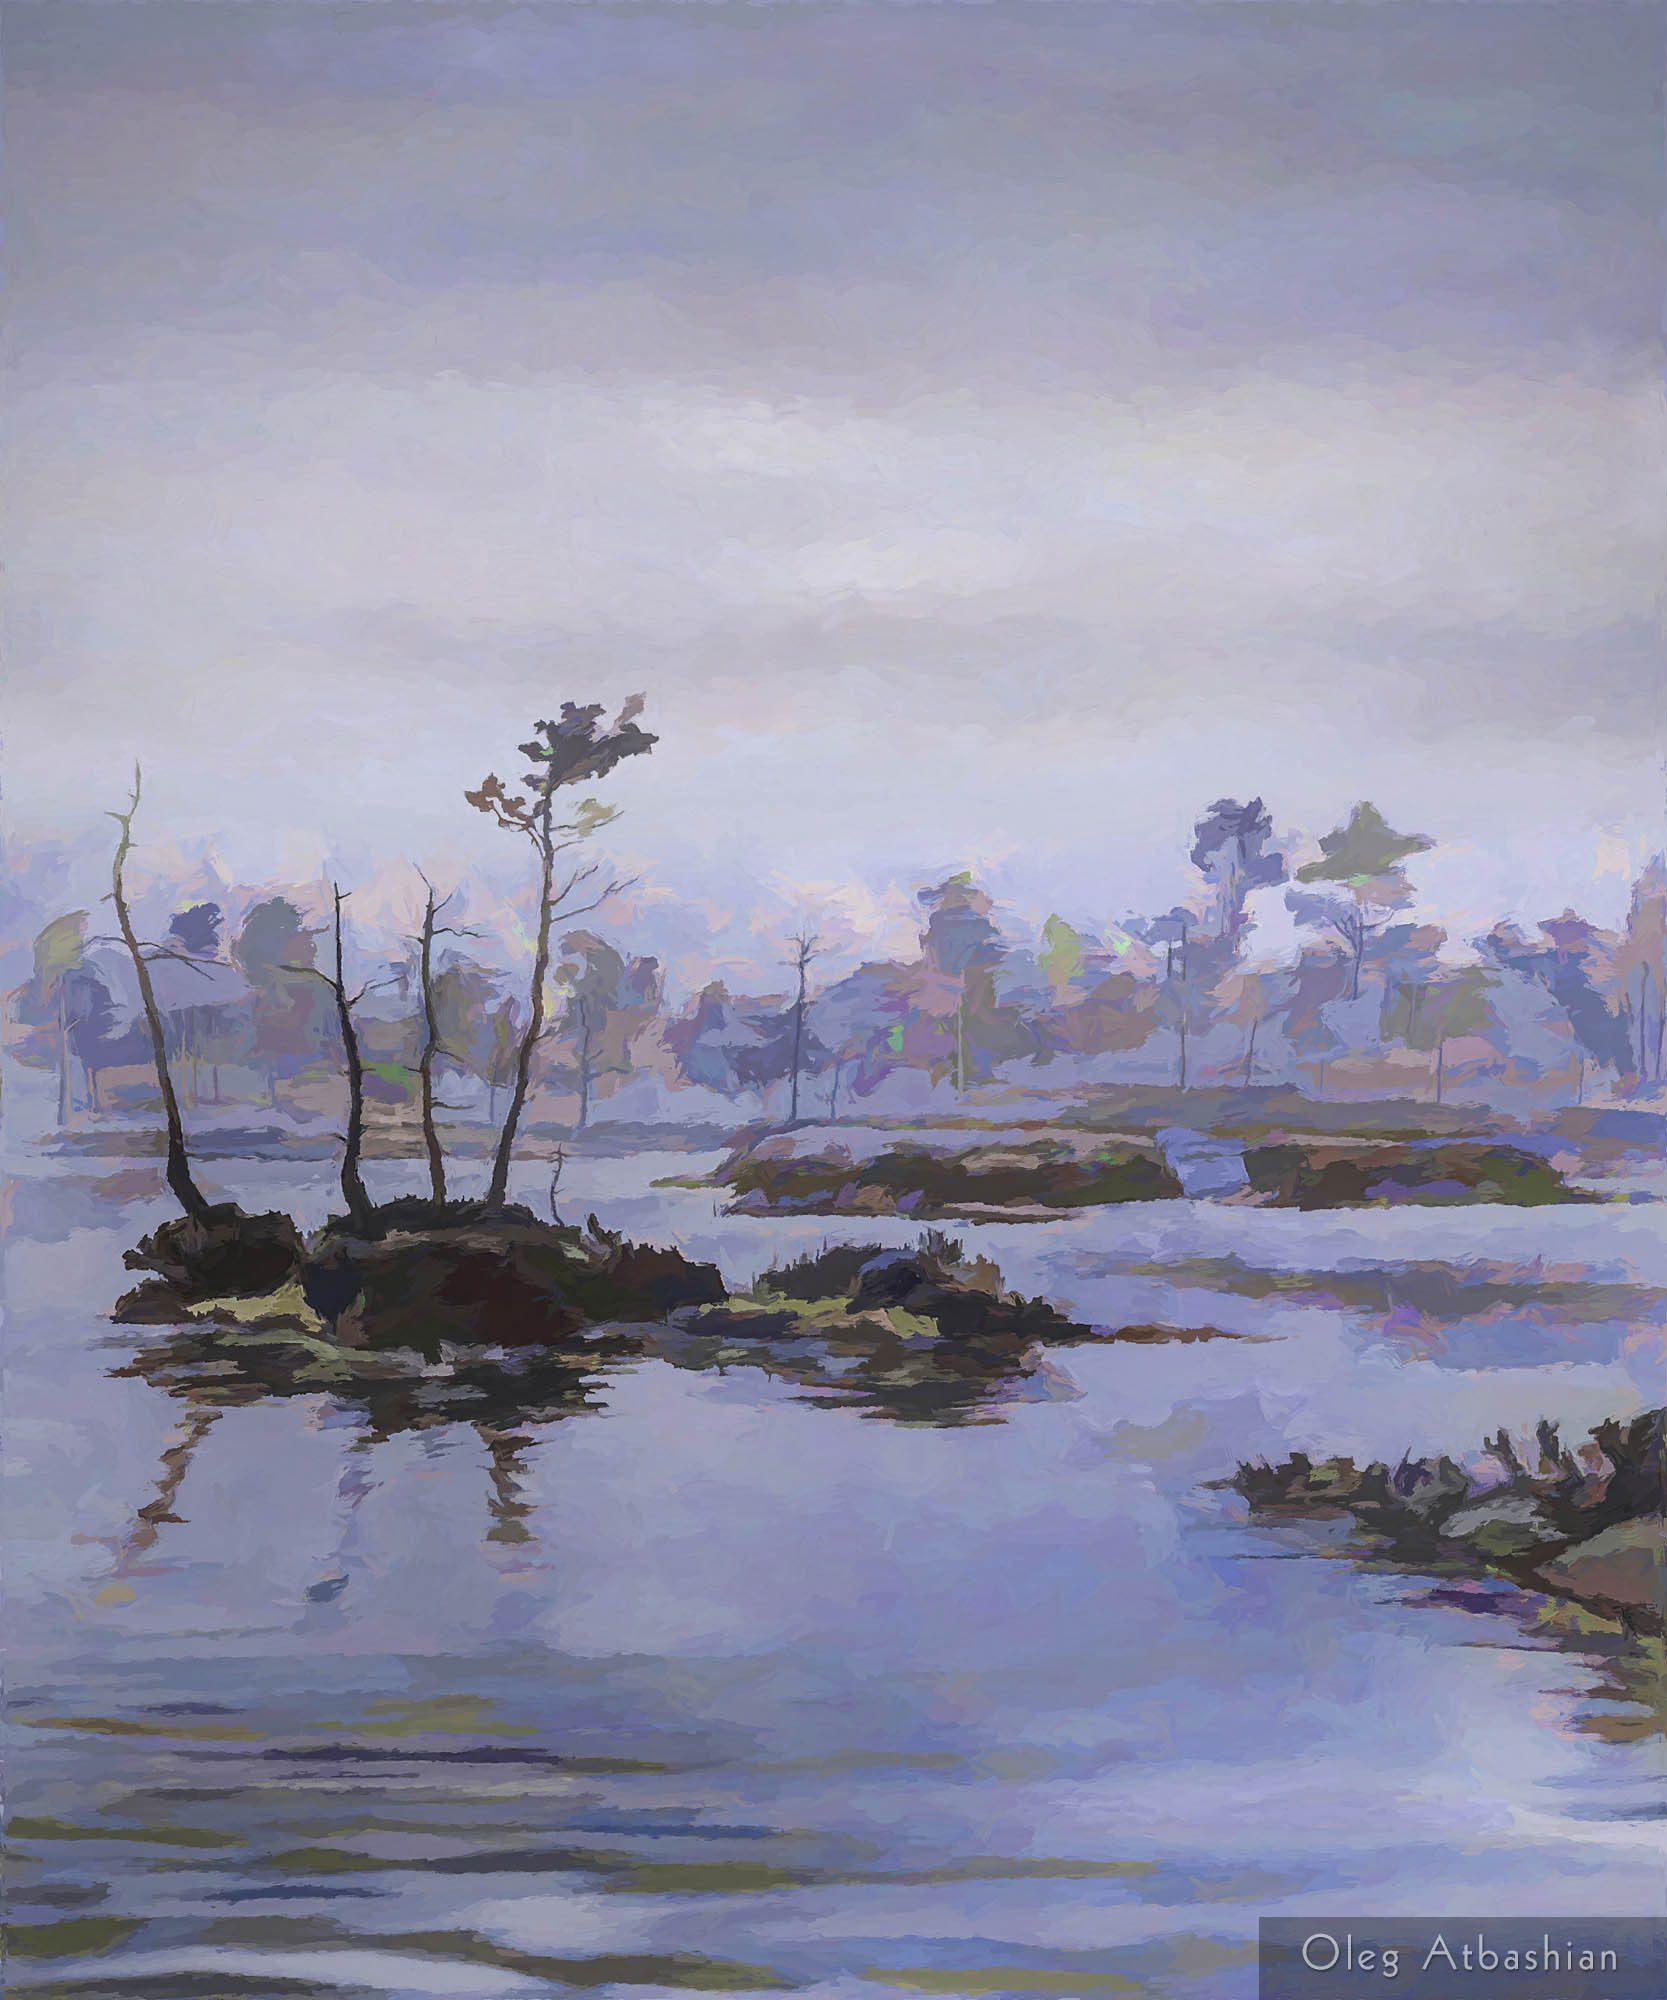 Unnamed Swamp in Siberia